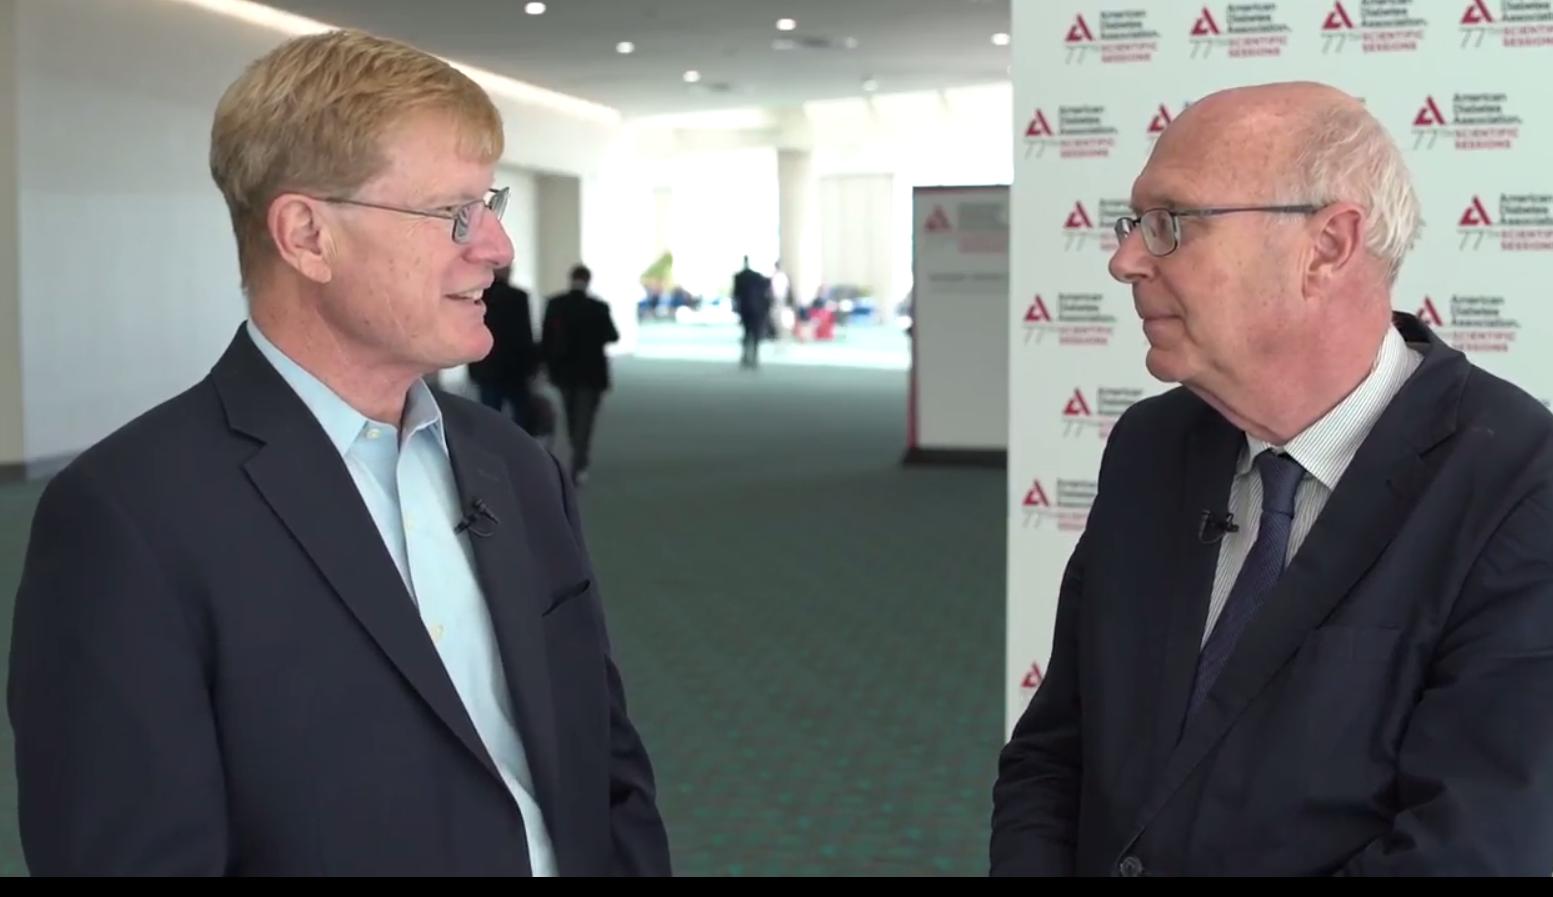 ADA 2017 – James Foley and Bo Ahren Discuss the Development of DPP-4 Inhibitors